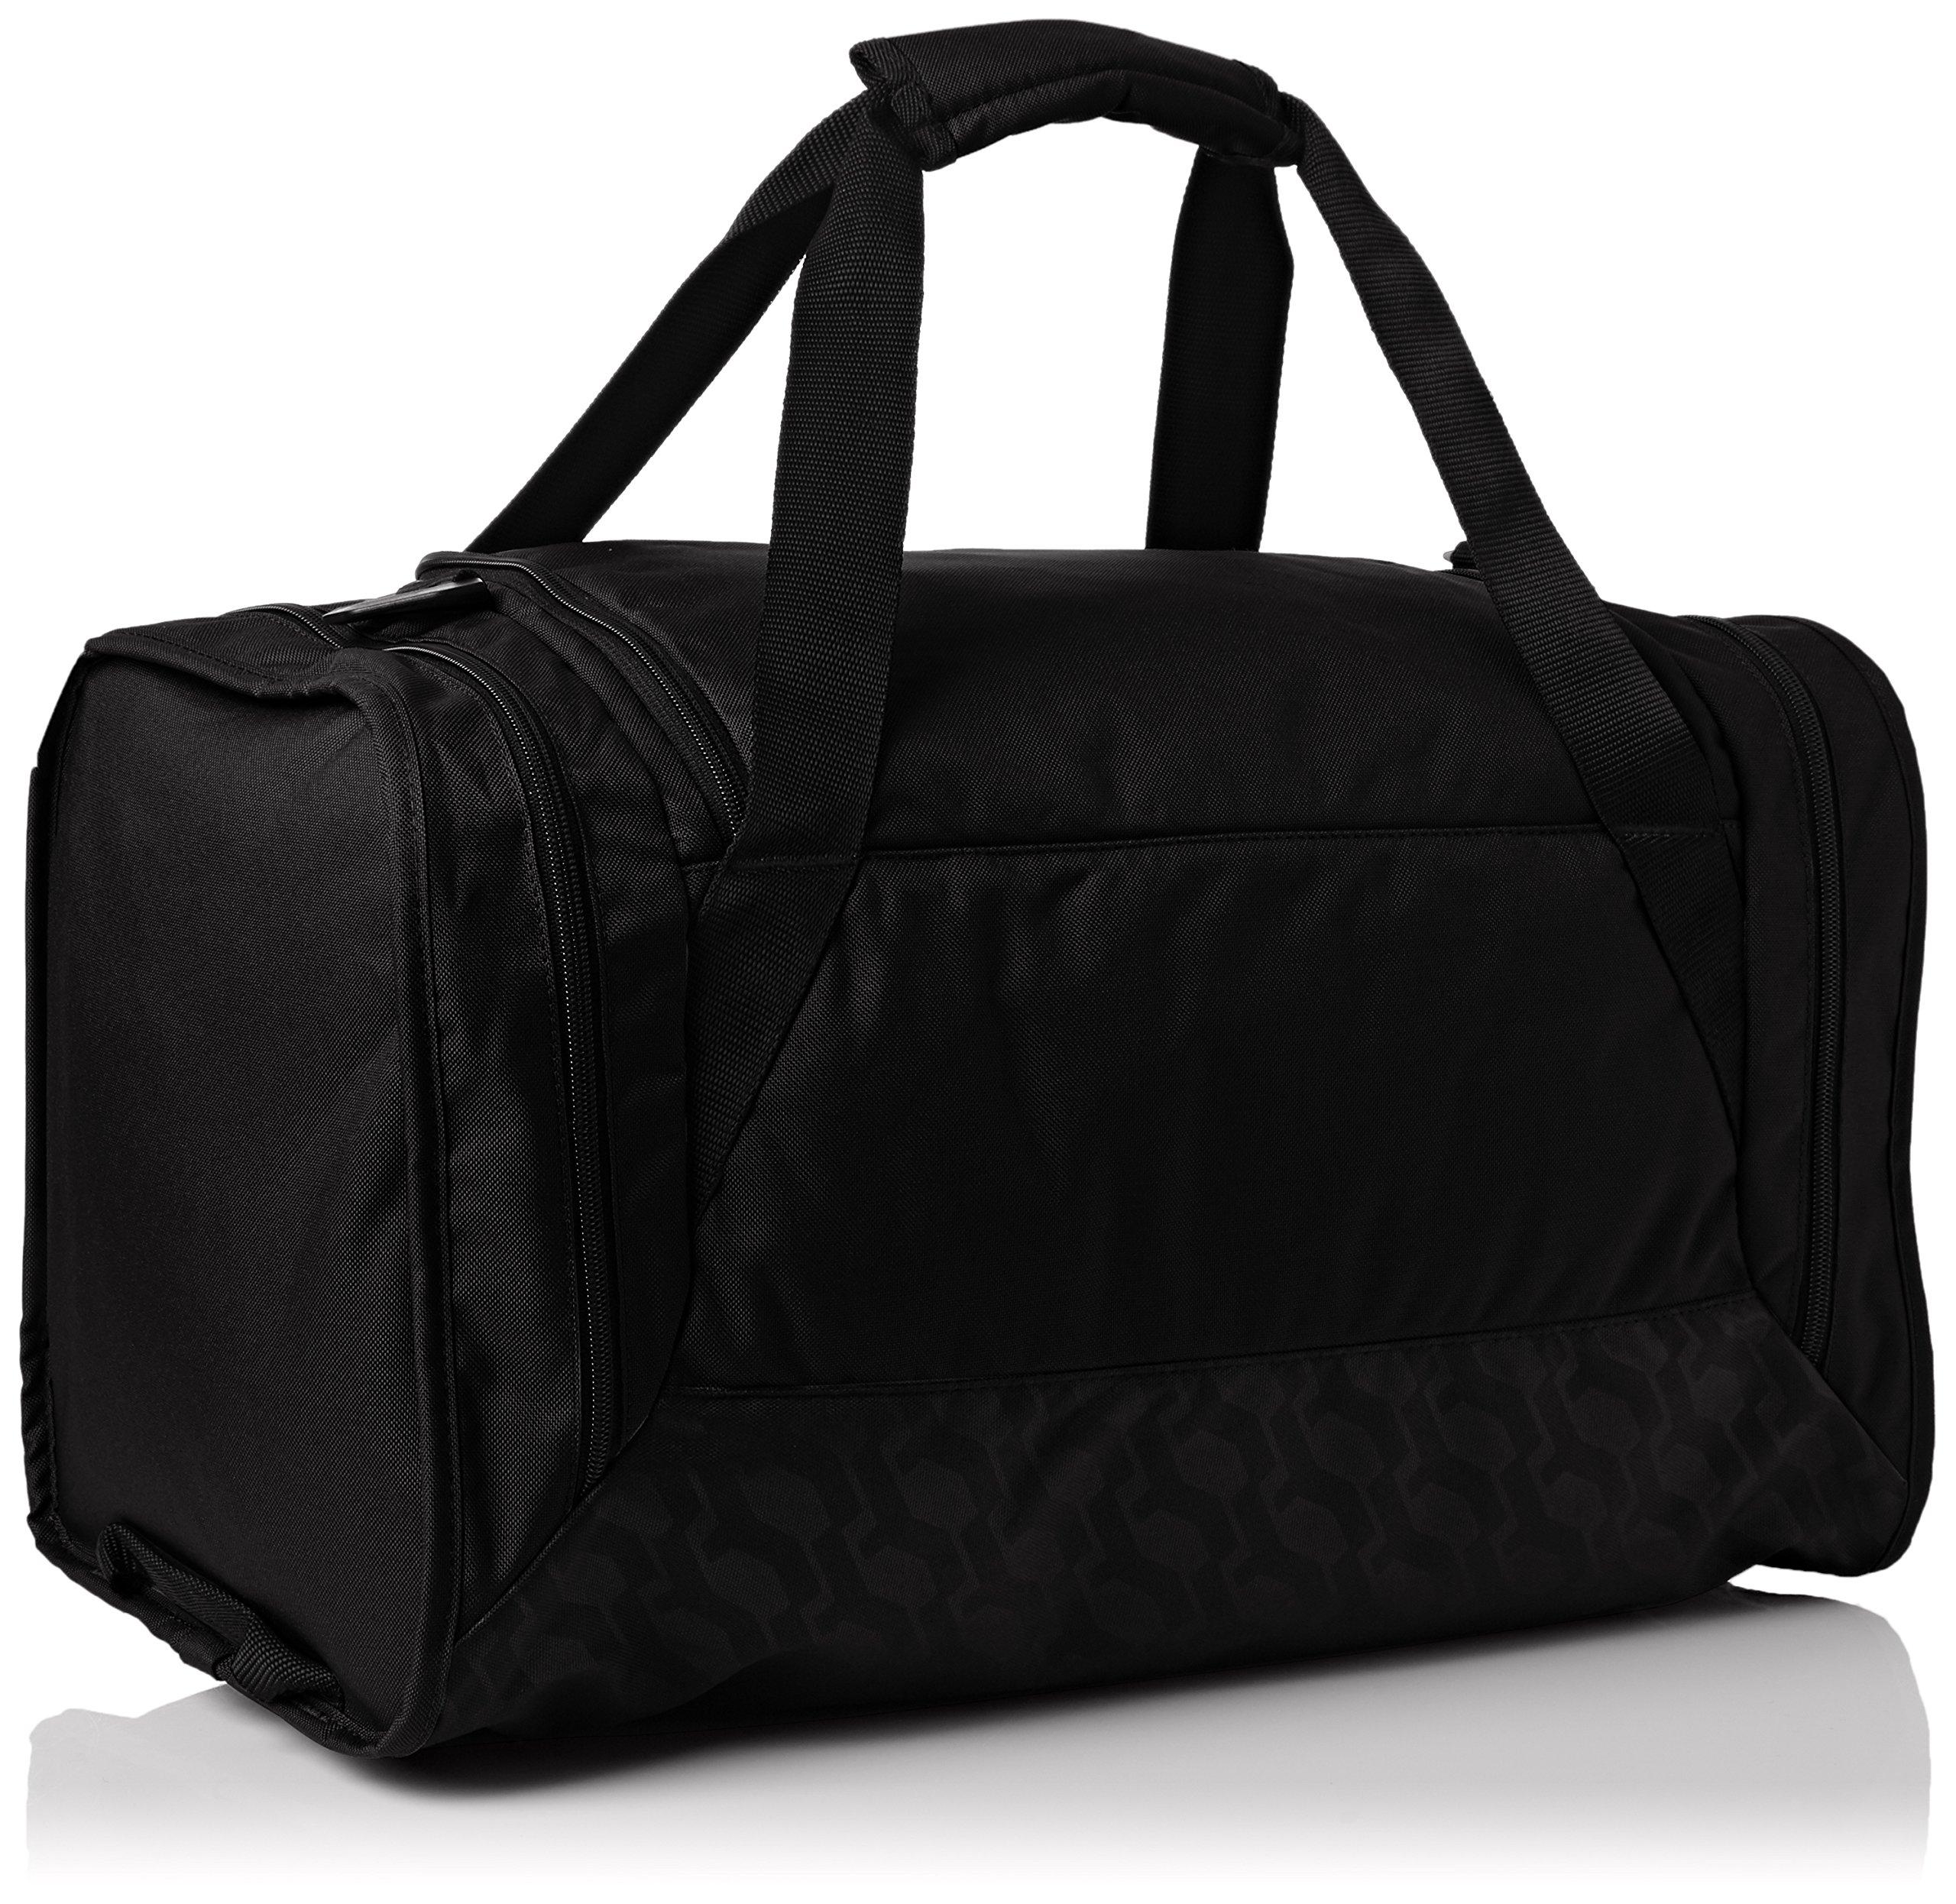 04b918f92a Nike Brasilia 6 Duffel Bag Black White Size Small - 0883153893756   Sports  Duffels   Clothing